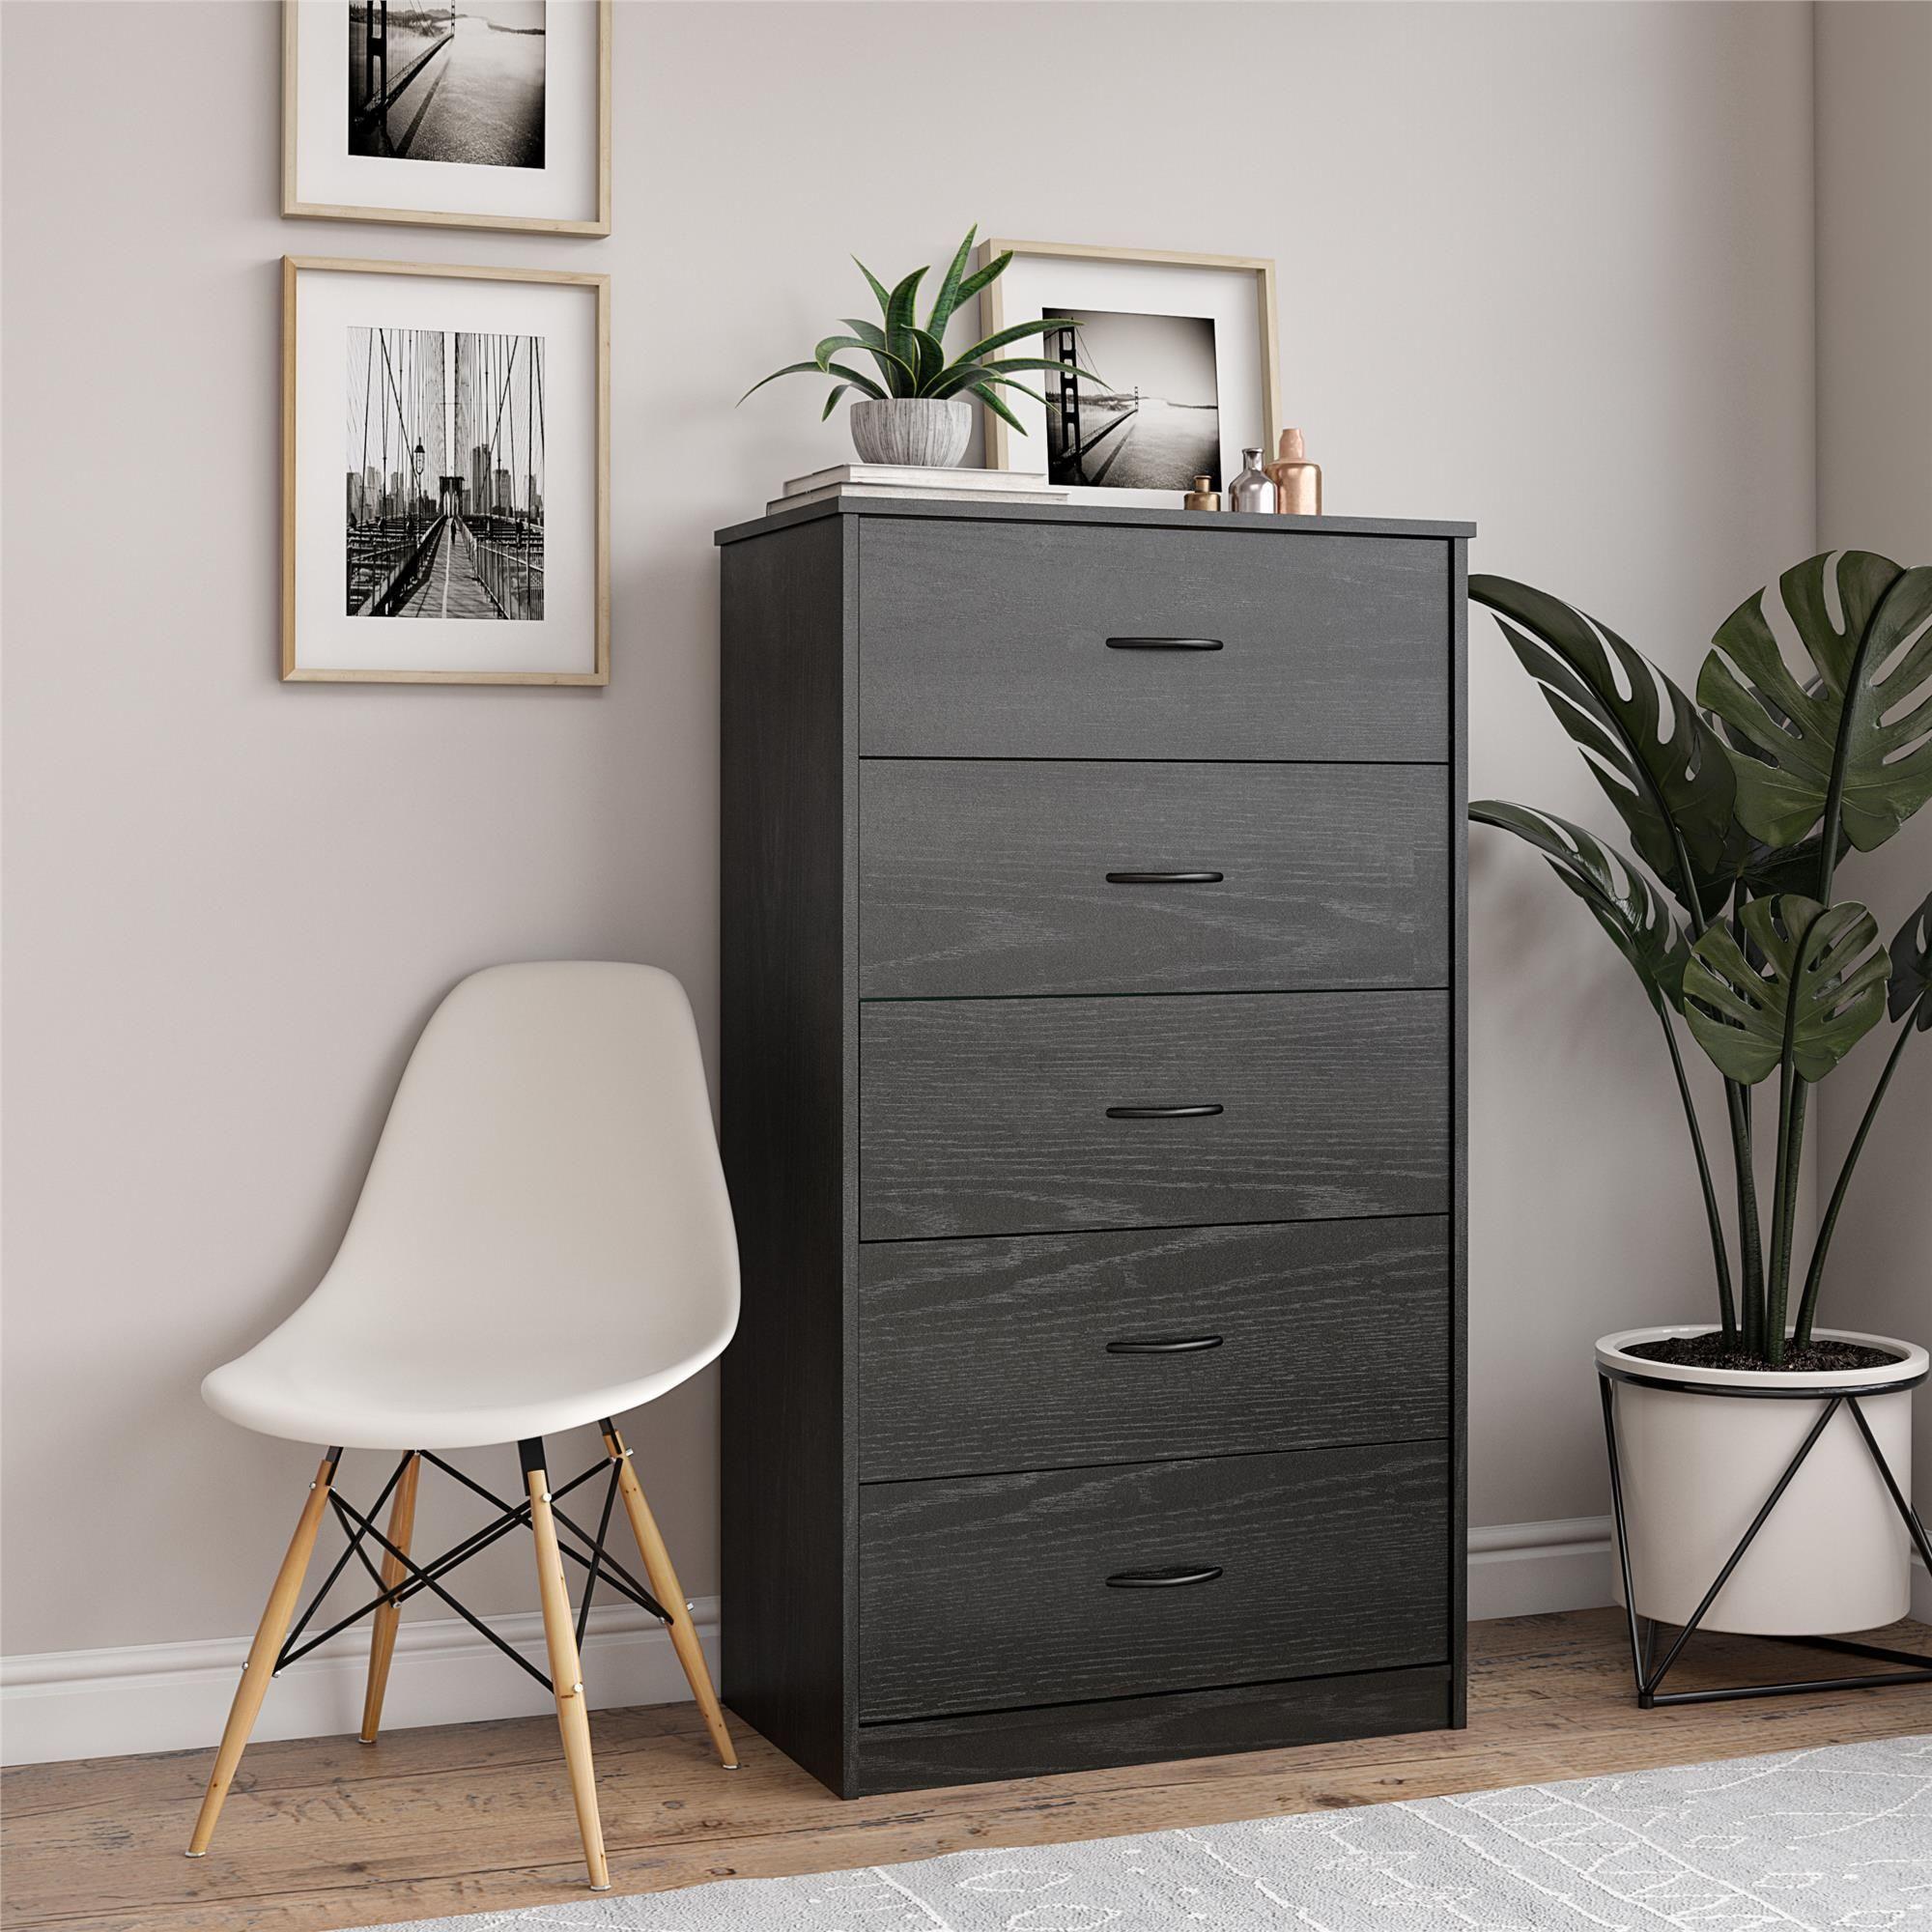 Mainstays Classic 5 Drawer Dresser Black Oak Finish Walmart Com Tall Dresser Decor Dresser Drawers Dresser Decor Bedroom [ 2000 x 2000 Pixel ]